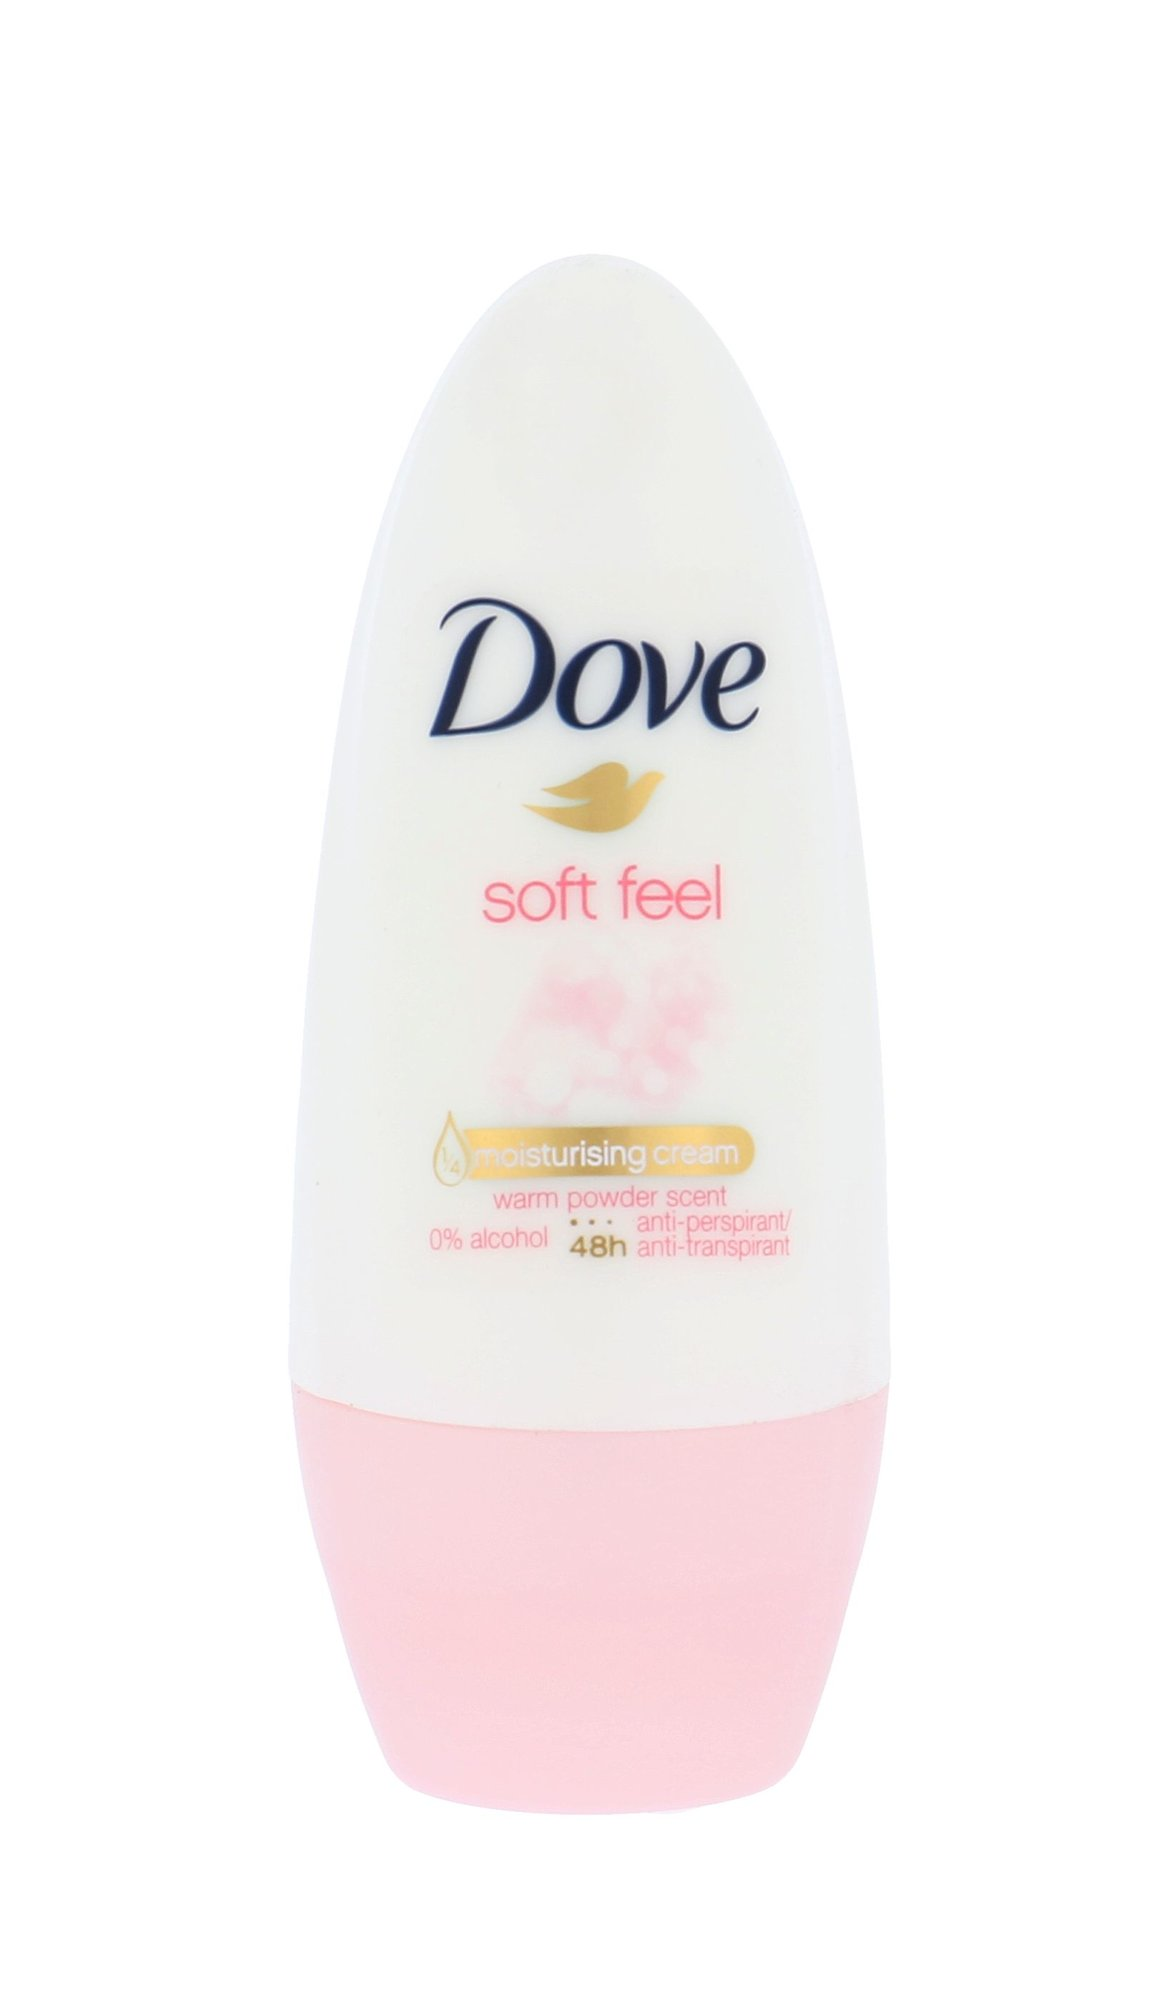 Dove Soft Feel Cosmetic 50ml